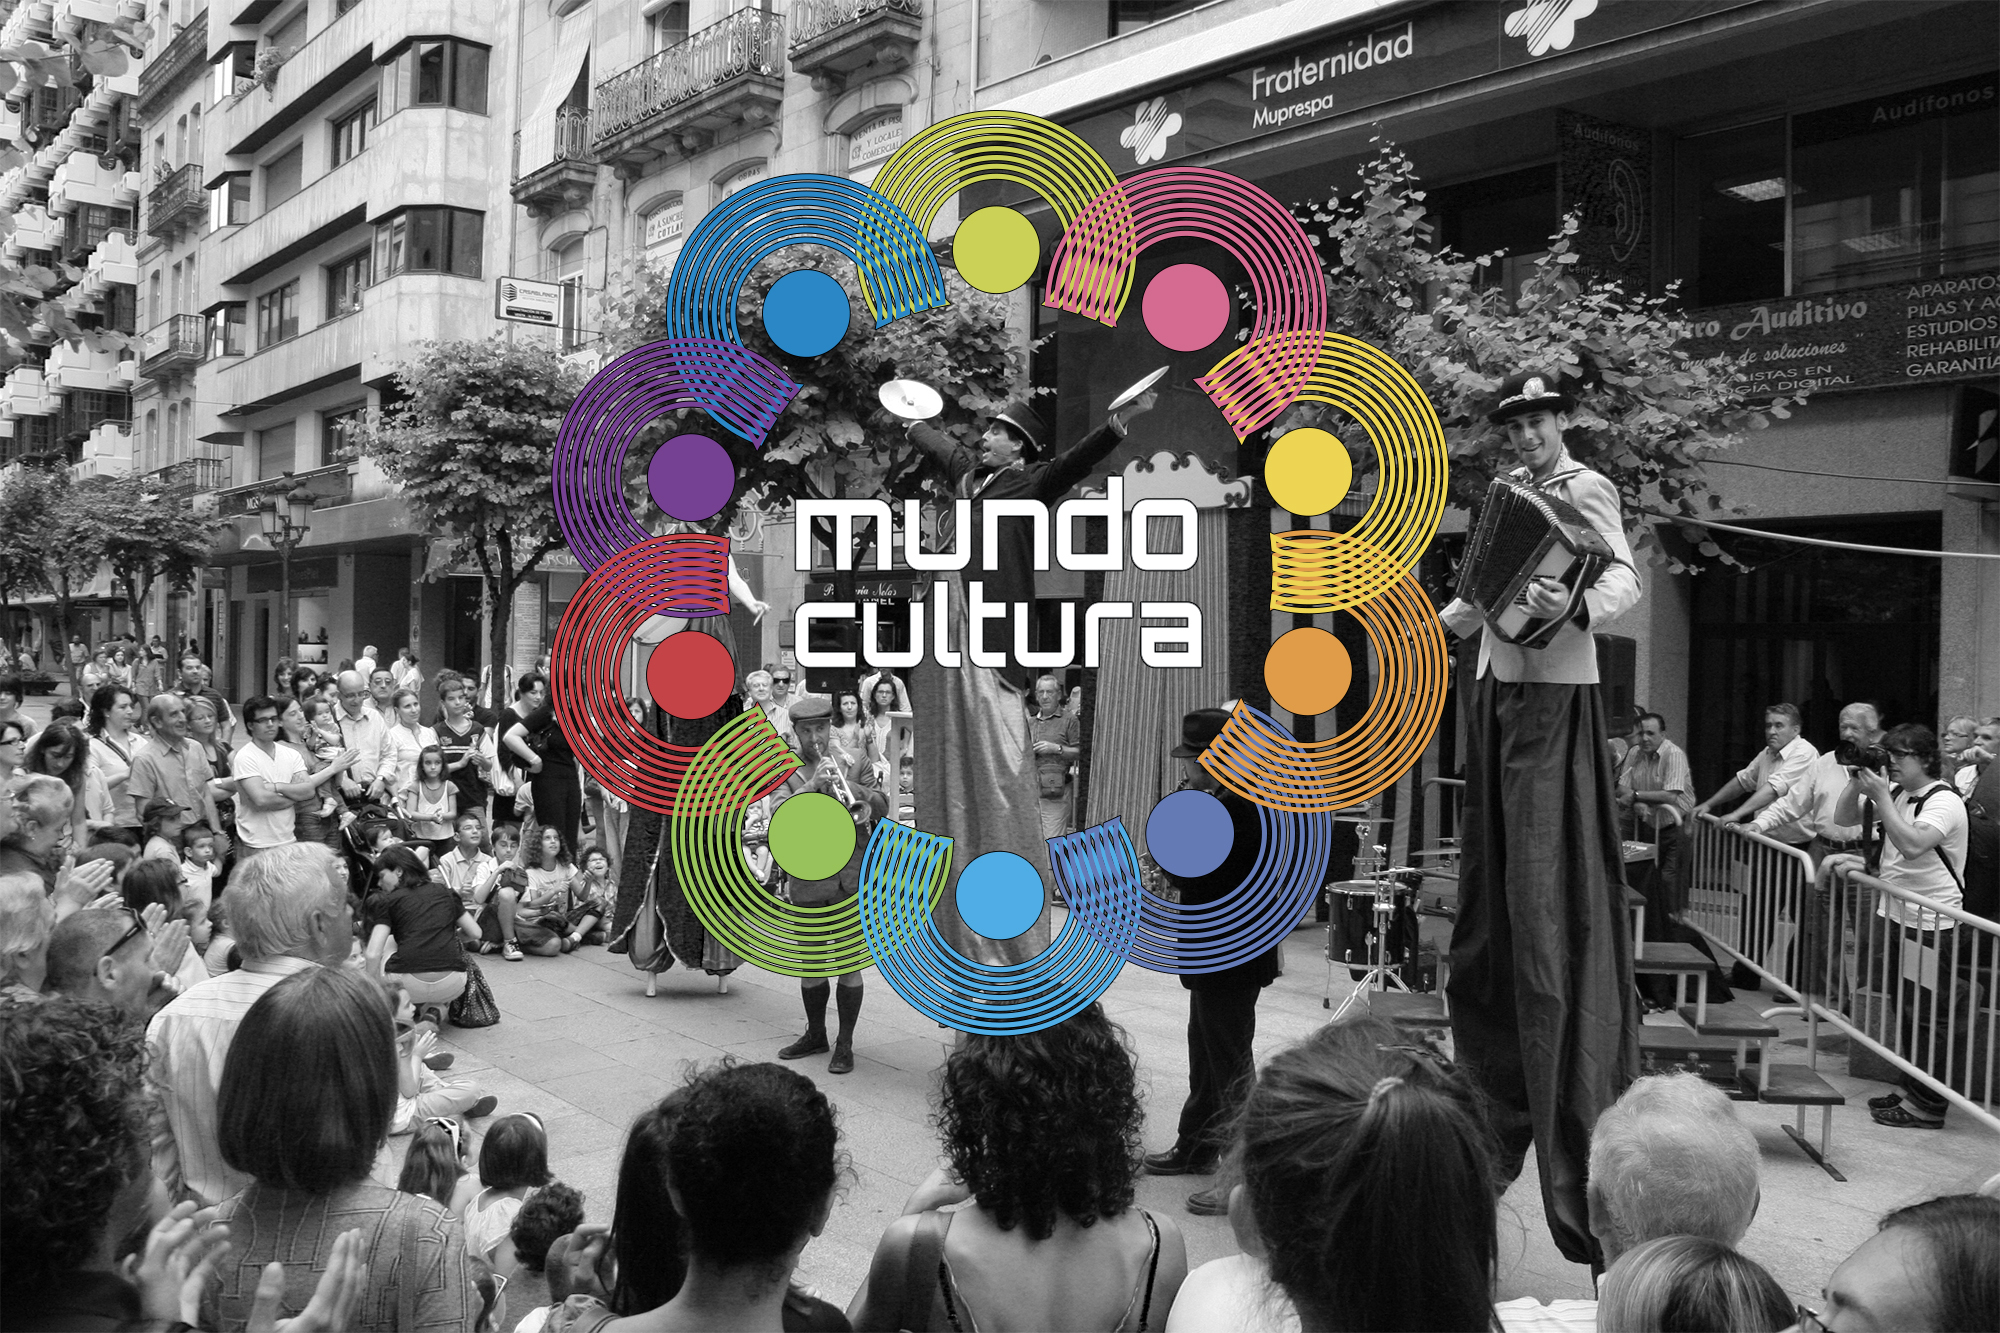 mundo cultura